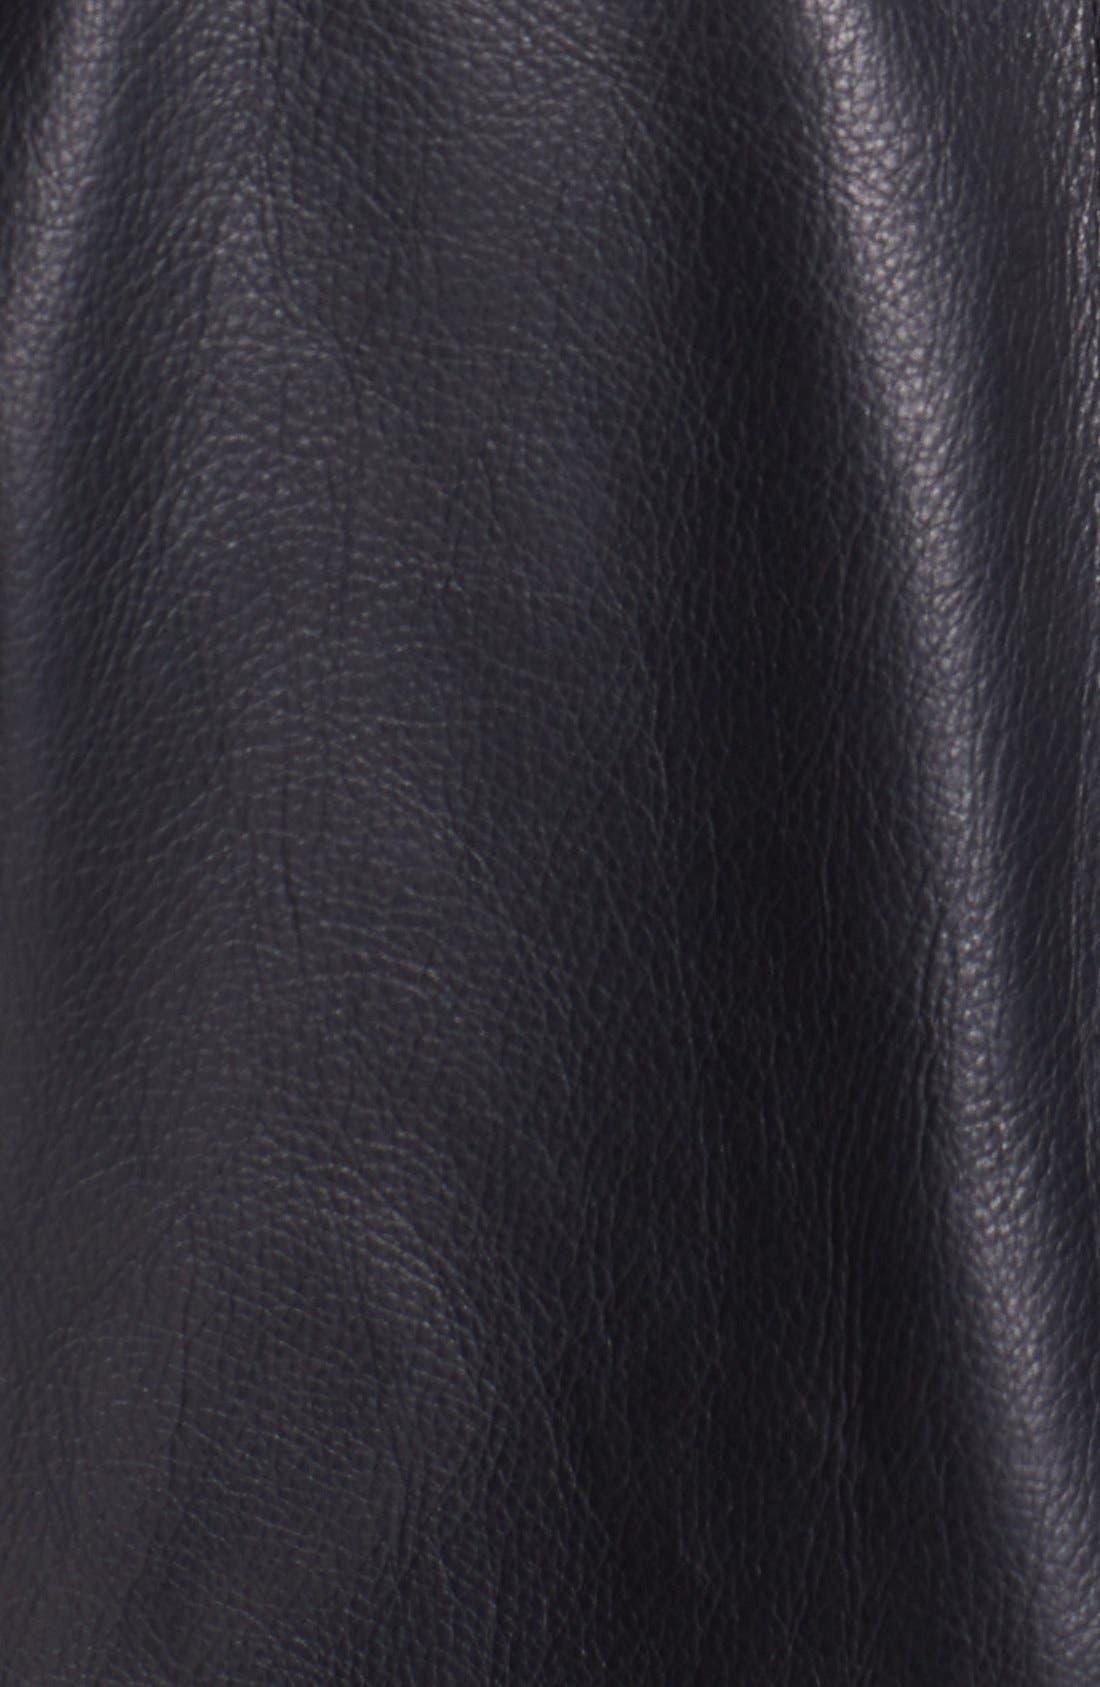 BILLY REID, Leather Flight Jacket, Alternate thumbnail 2, color, 001